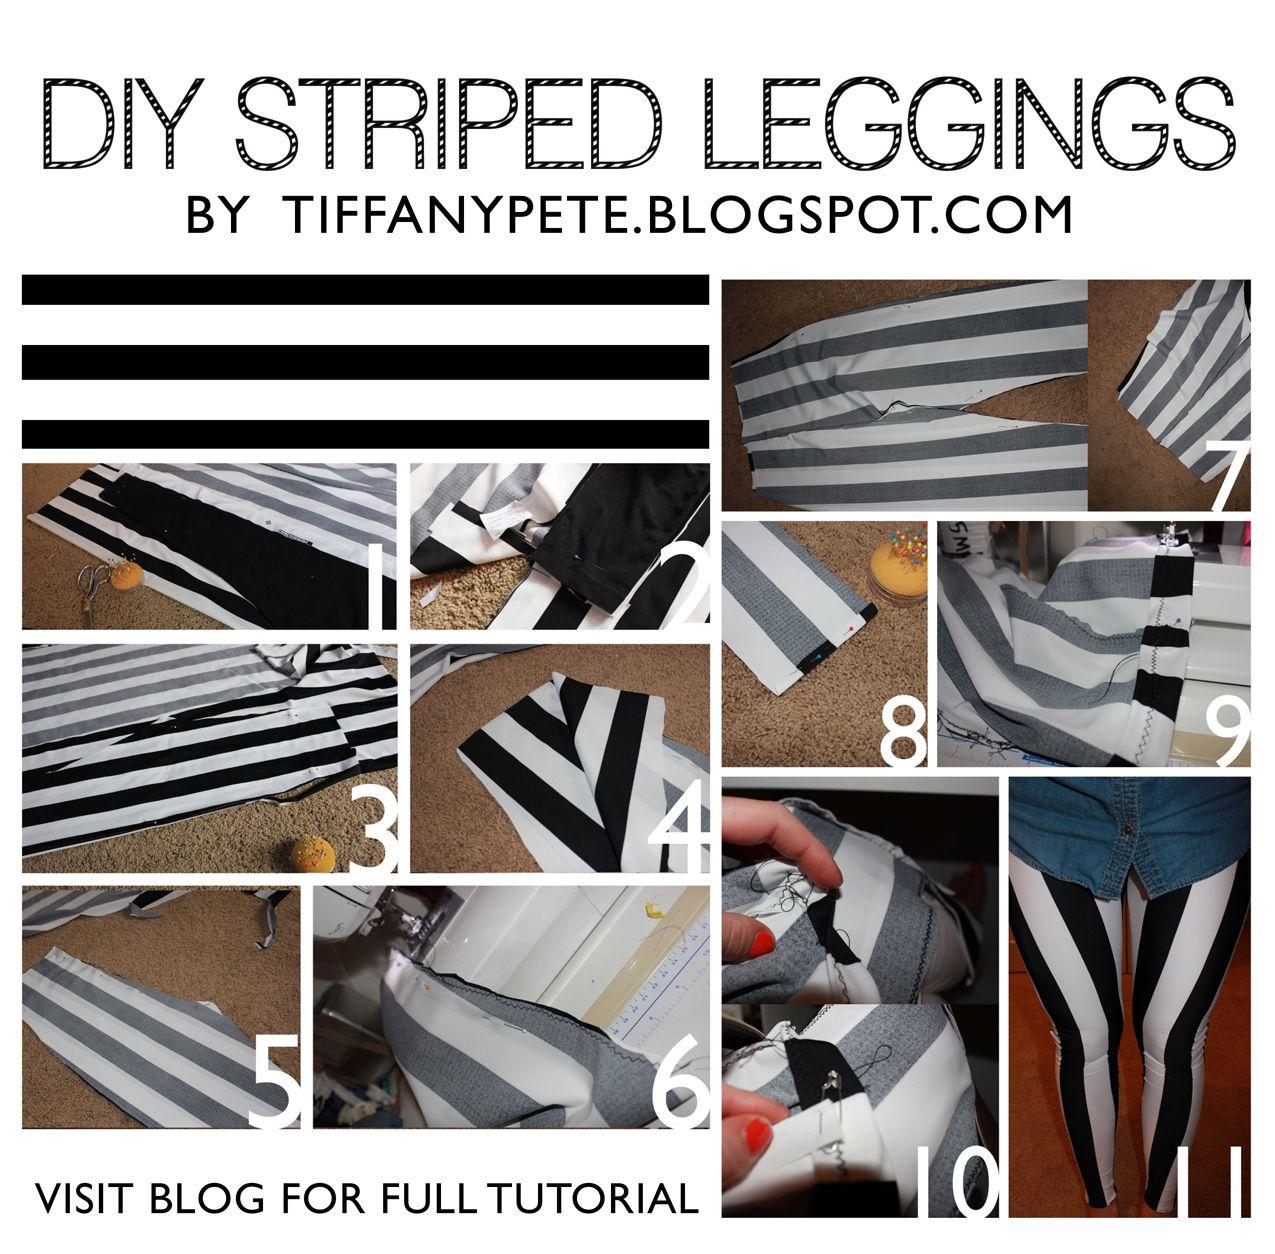 tiffanypete: DIY STRIPED LEGGINGS